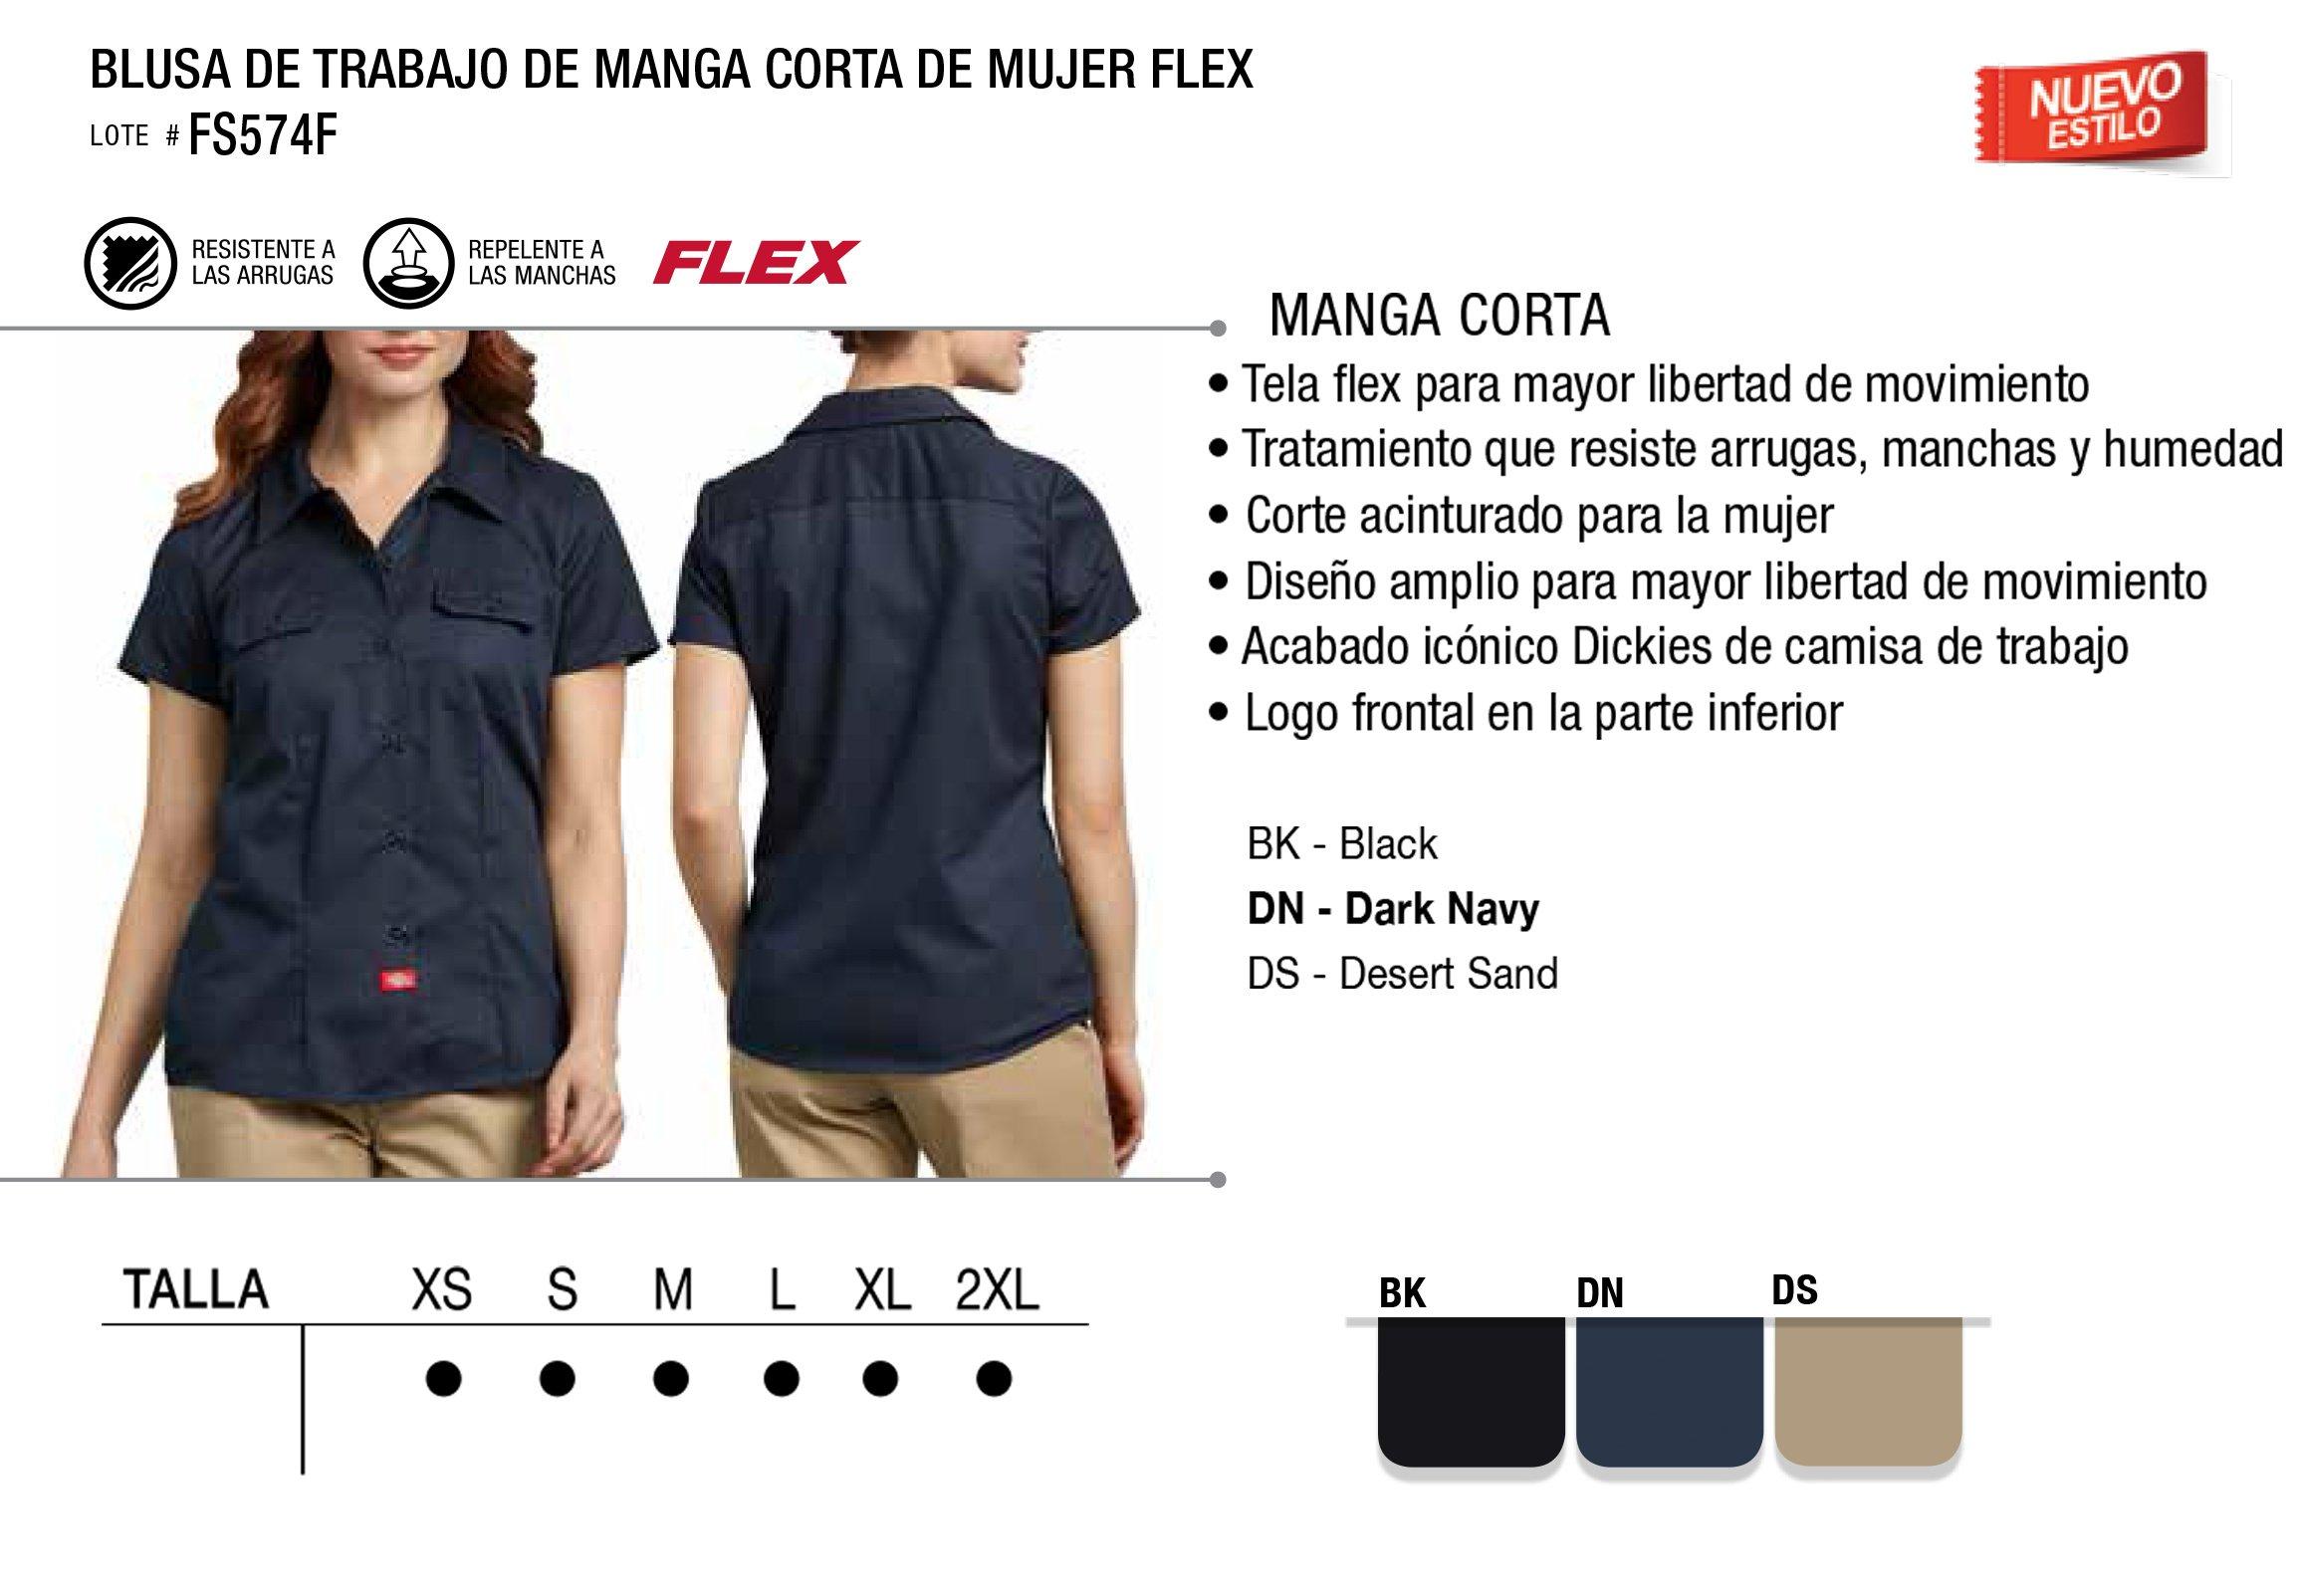 Blusa de Trabajo de Manga Corta de Mujer Flex. FS574F.